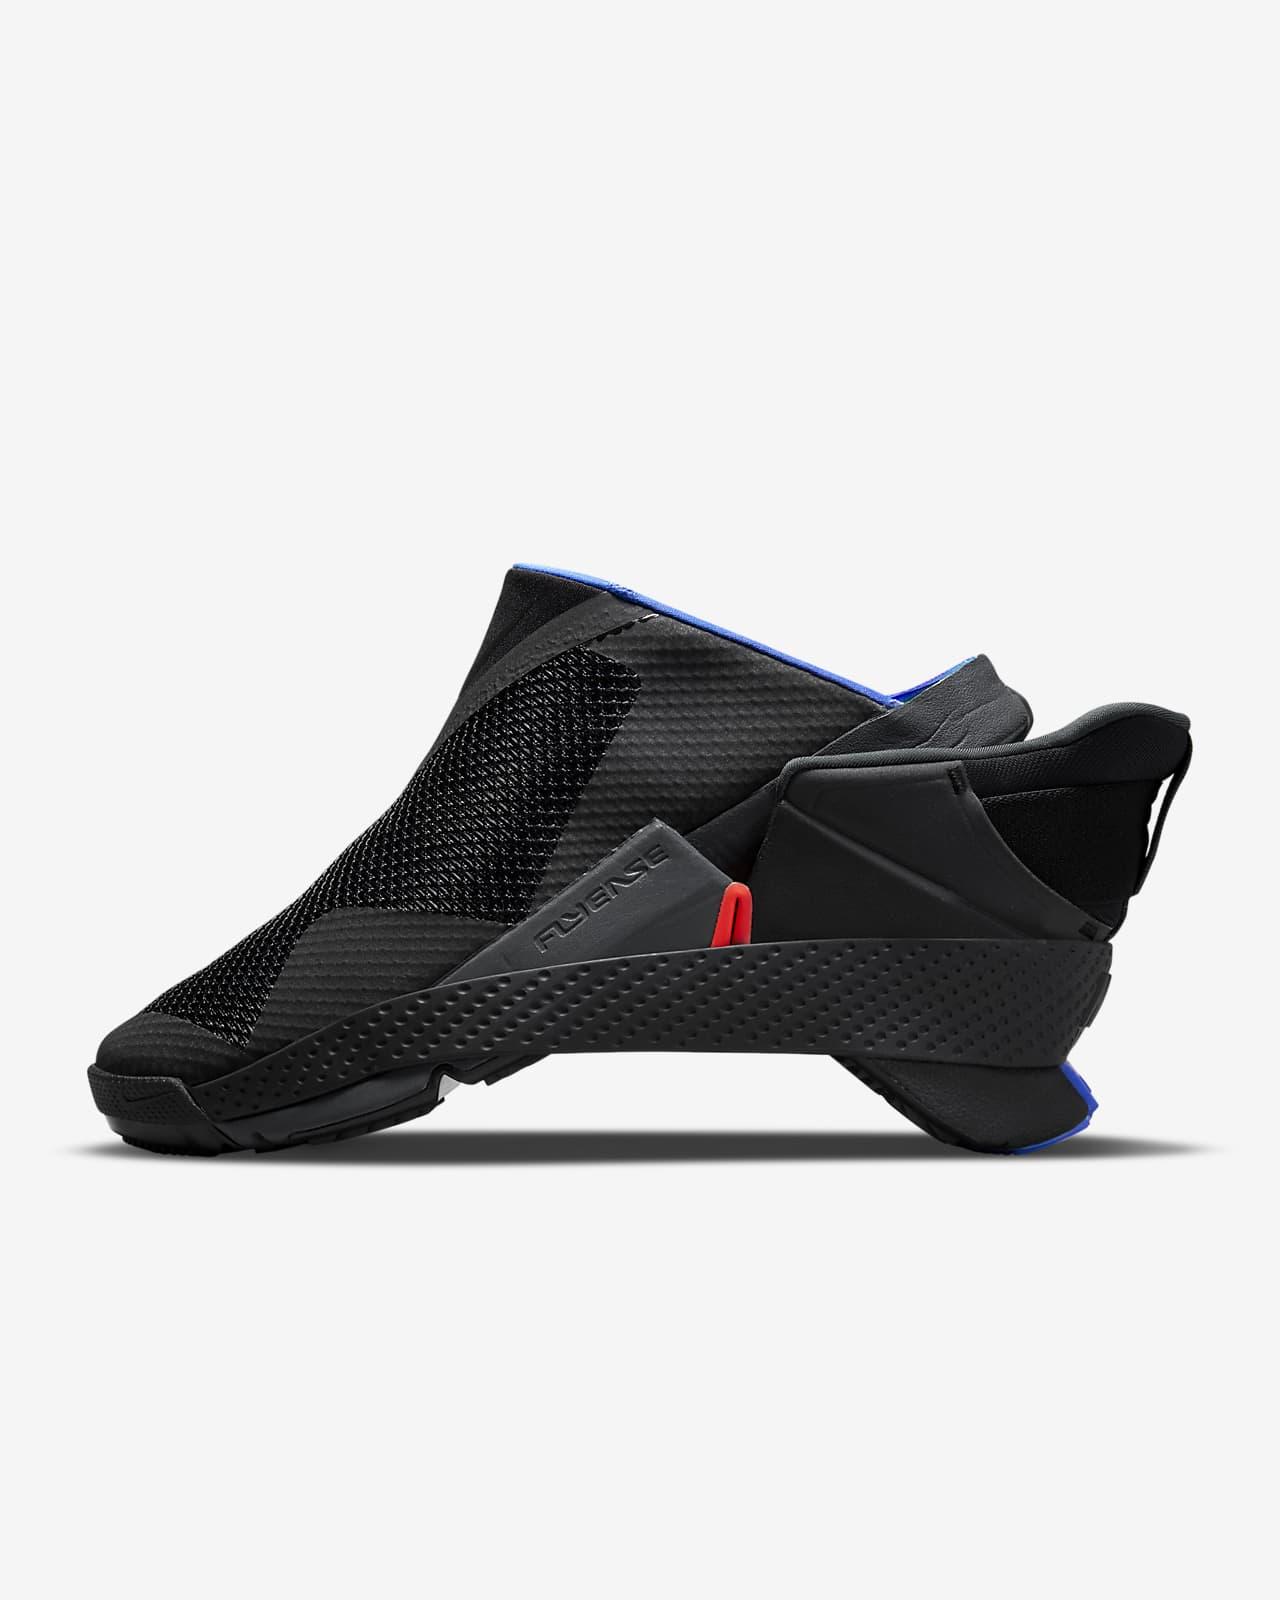 Sapatilhas Nike Go FlyEase